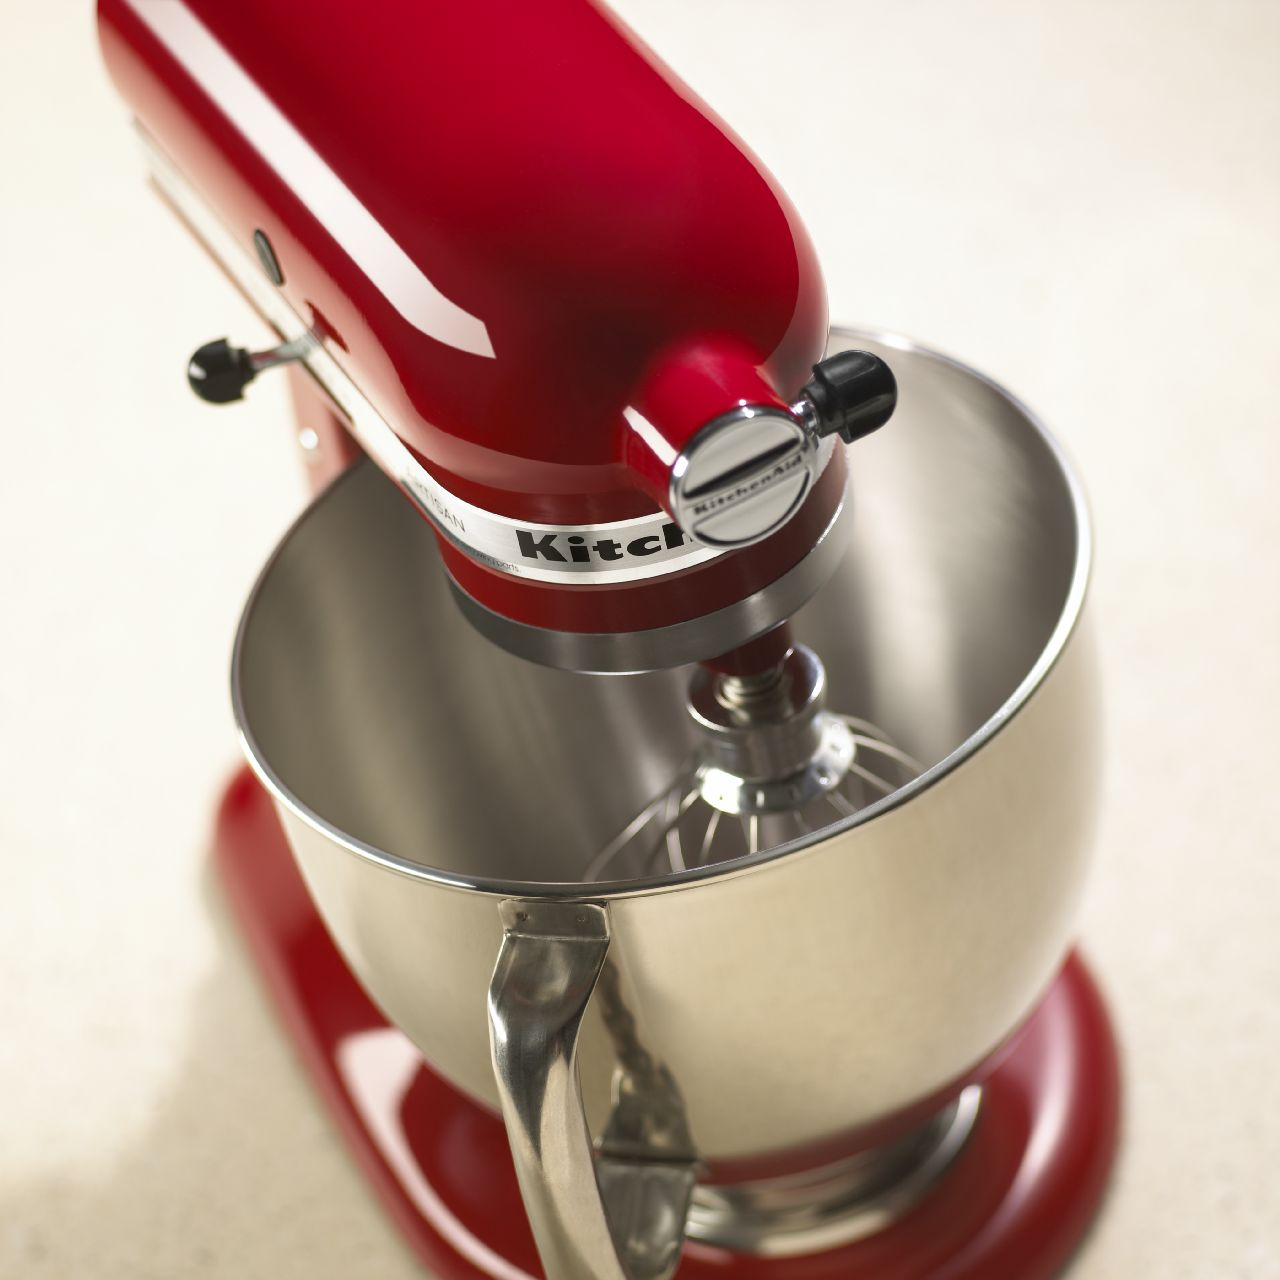 KitchenAid-Artisan-Series-5-Quart-Tilt-Head-Stand-Mixer-10-Speeds-KSM150PS thumbnail 53